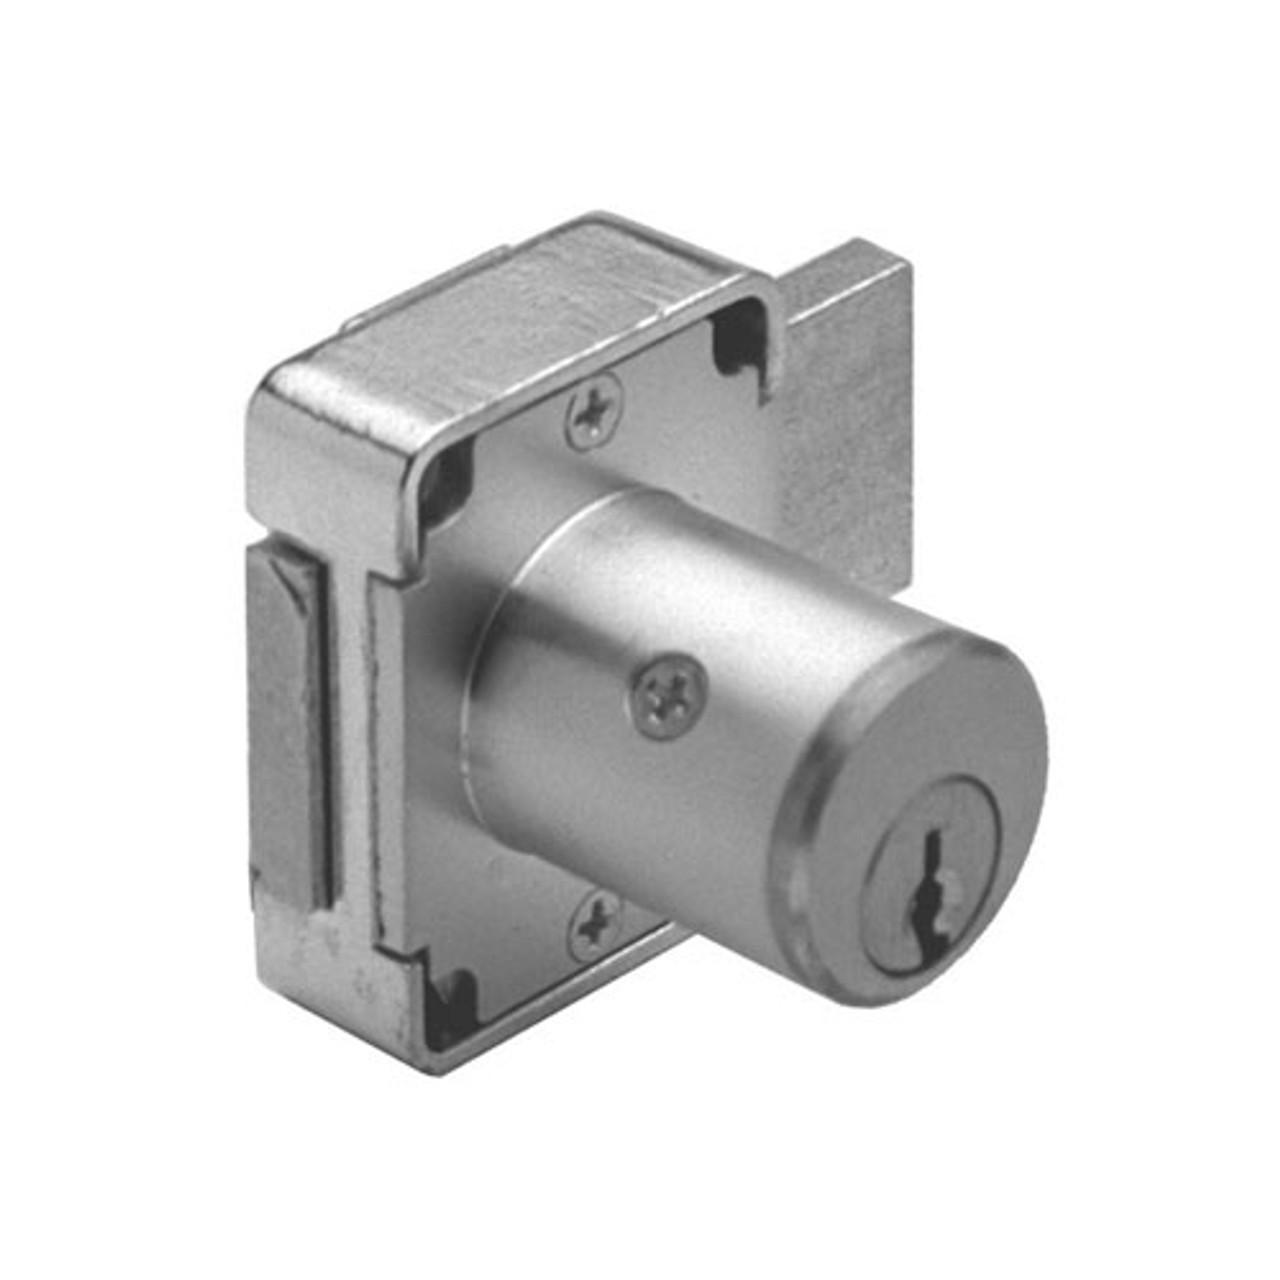 Olympus 100DR-KA103-26D-1-3/8 Deadbolt Locks in Satin Chrome Finish